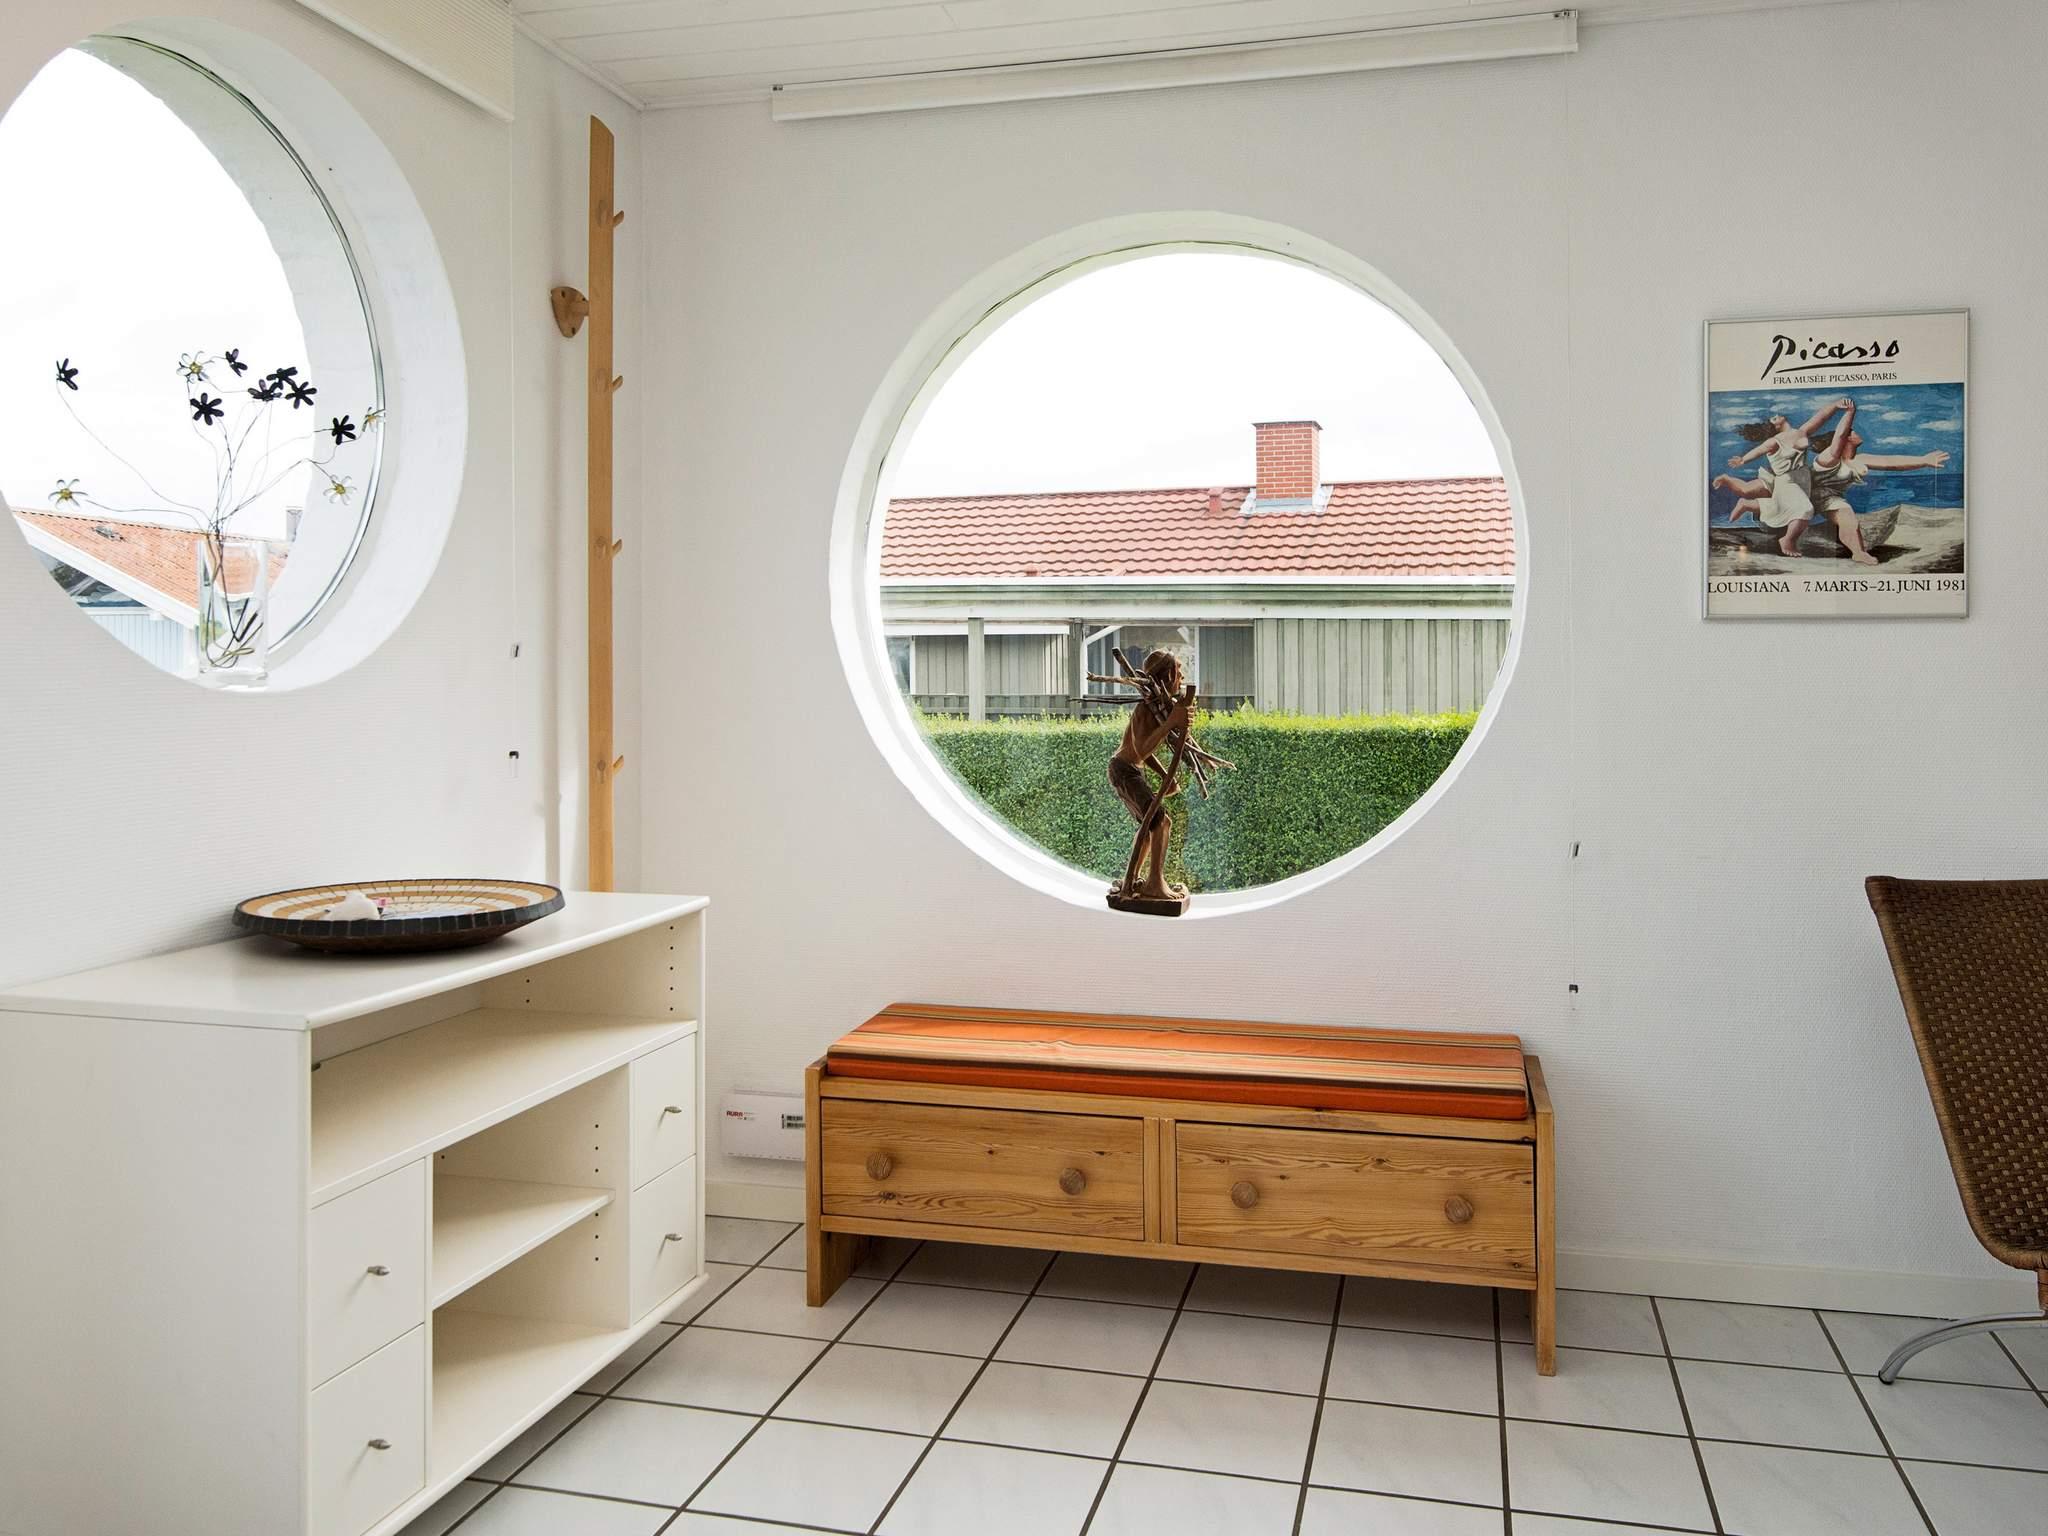 Ferienhaus Ajstrup Strand/Malling (2355032), Ajstrup, , Dänische Ostsee, Dänemark, Bild 9